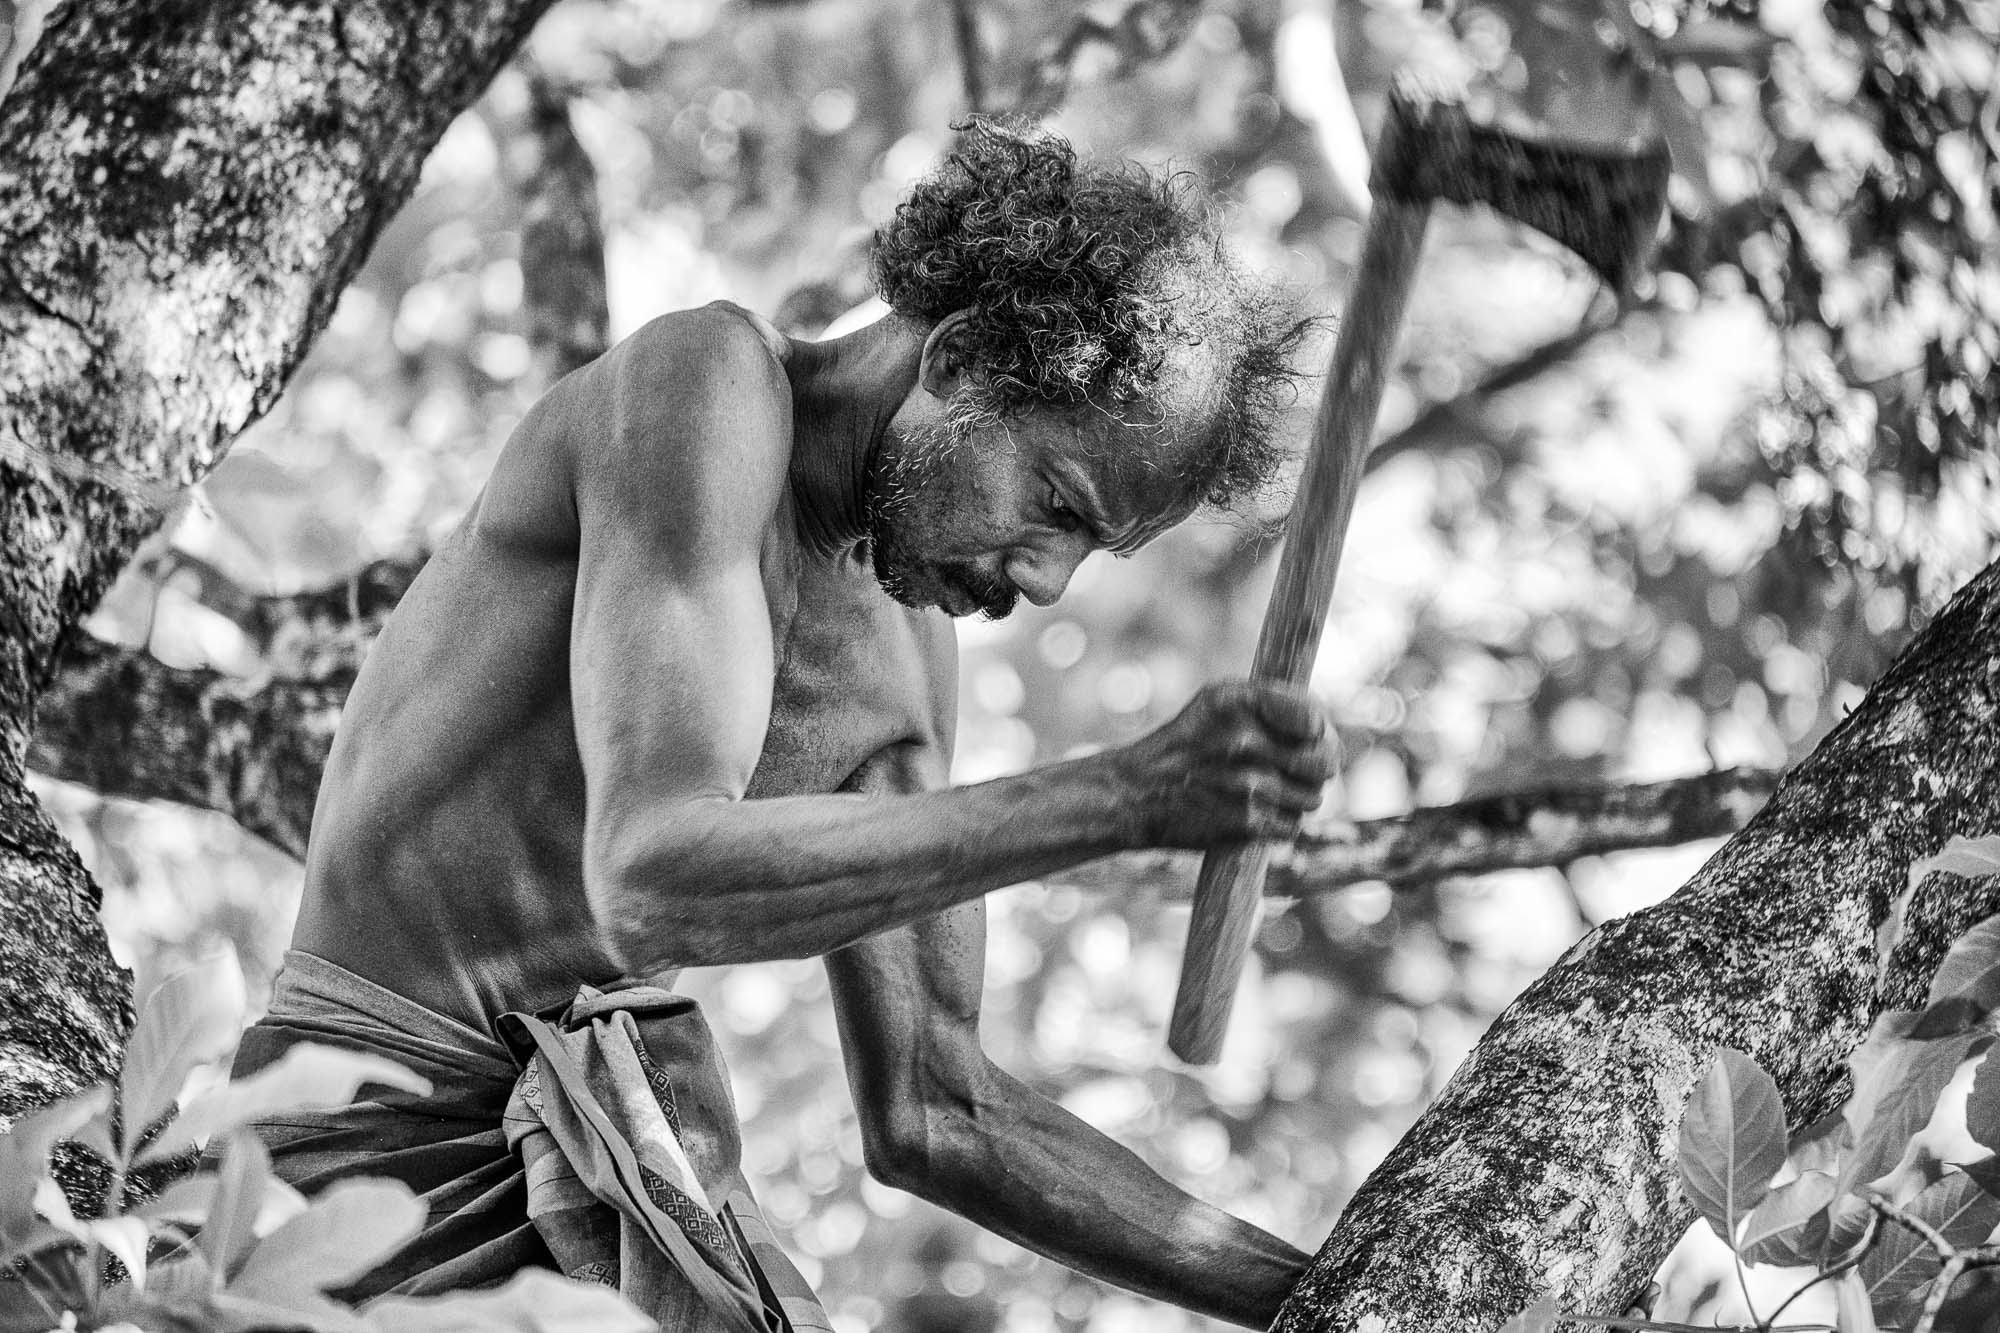 Vadda sri lanka indingenous group people photography - veddas man cutting the tree